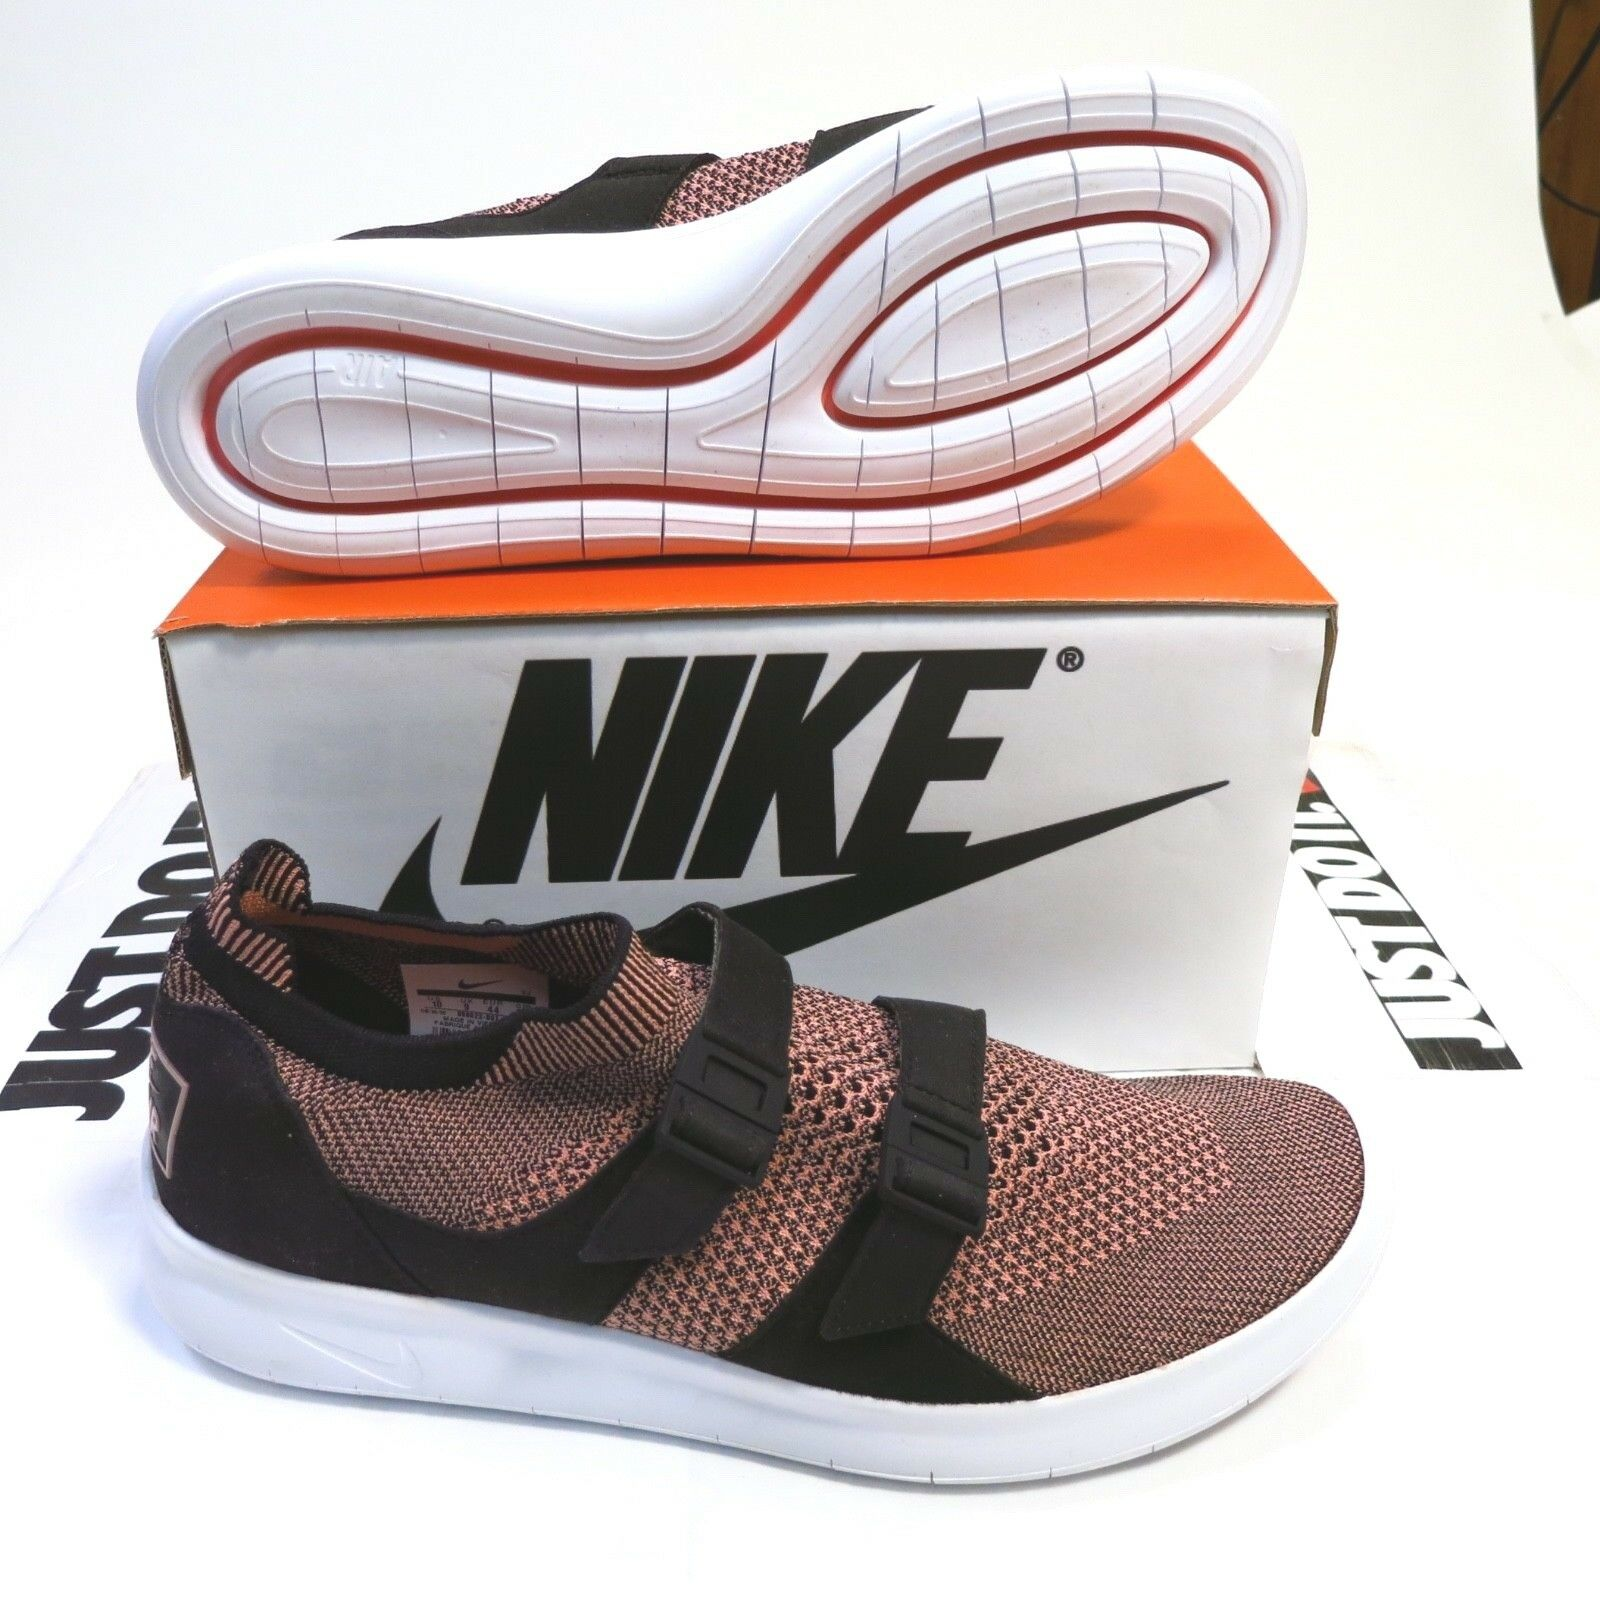 130 Men's Nike Air Sockracer Flyknit Size 9 Black Melon Style 898022 003 NEW